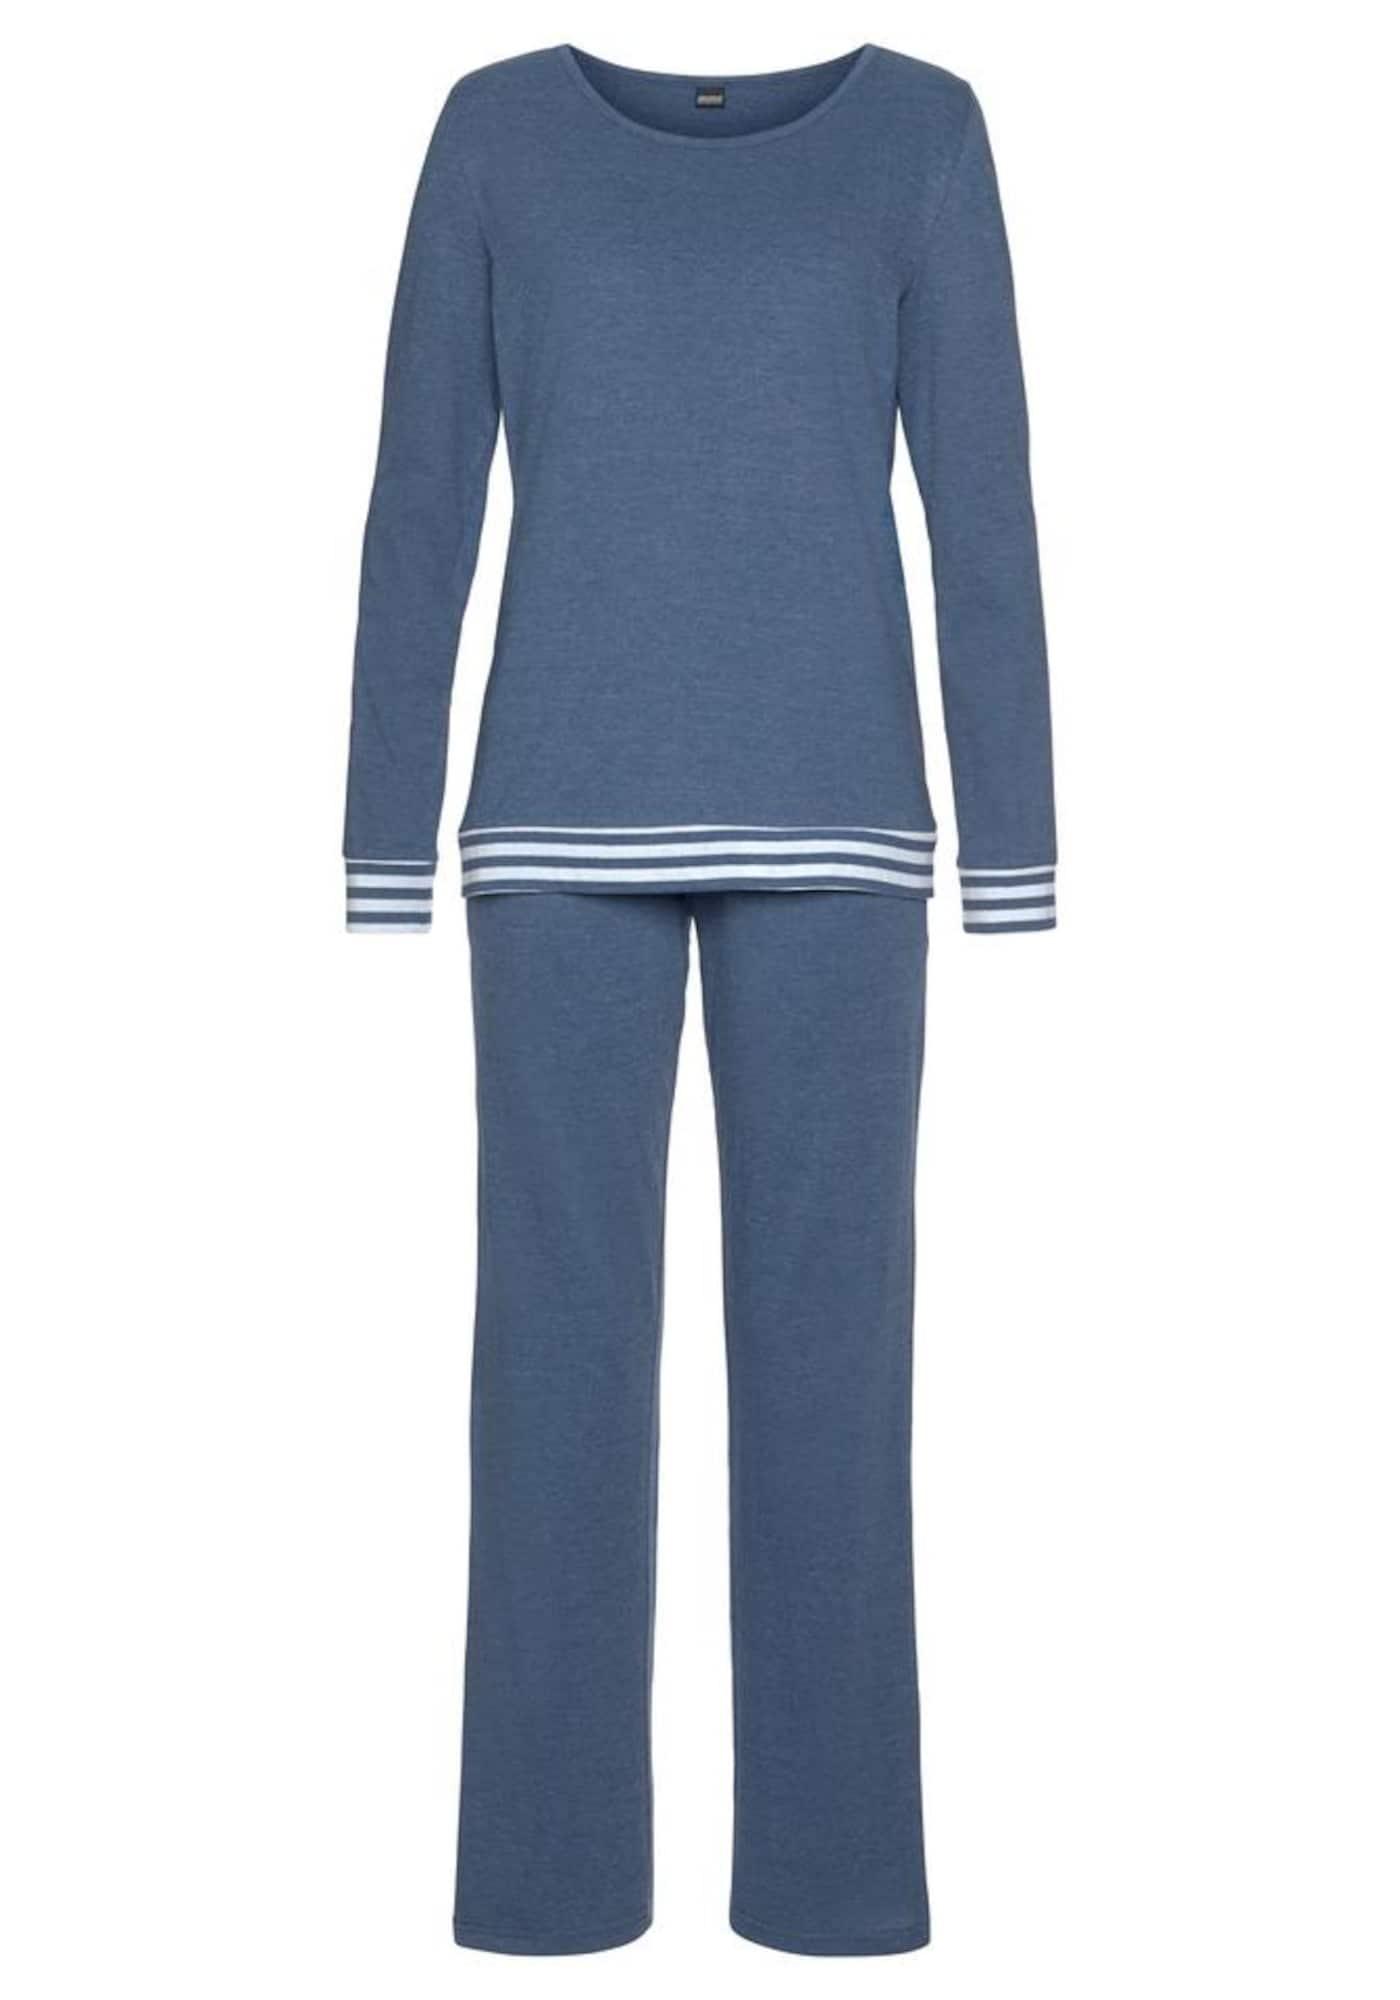 ARIZONA Pižama tamsiai mėlyna